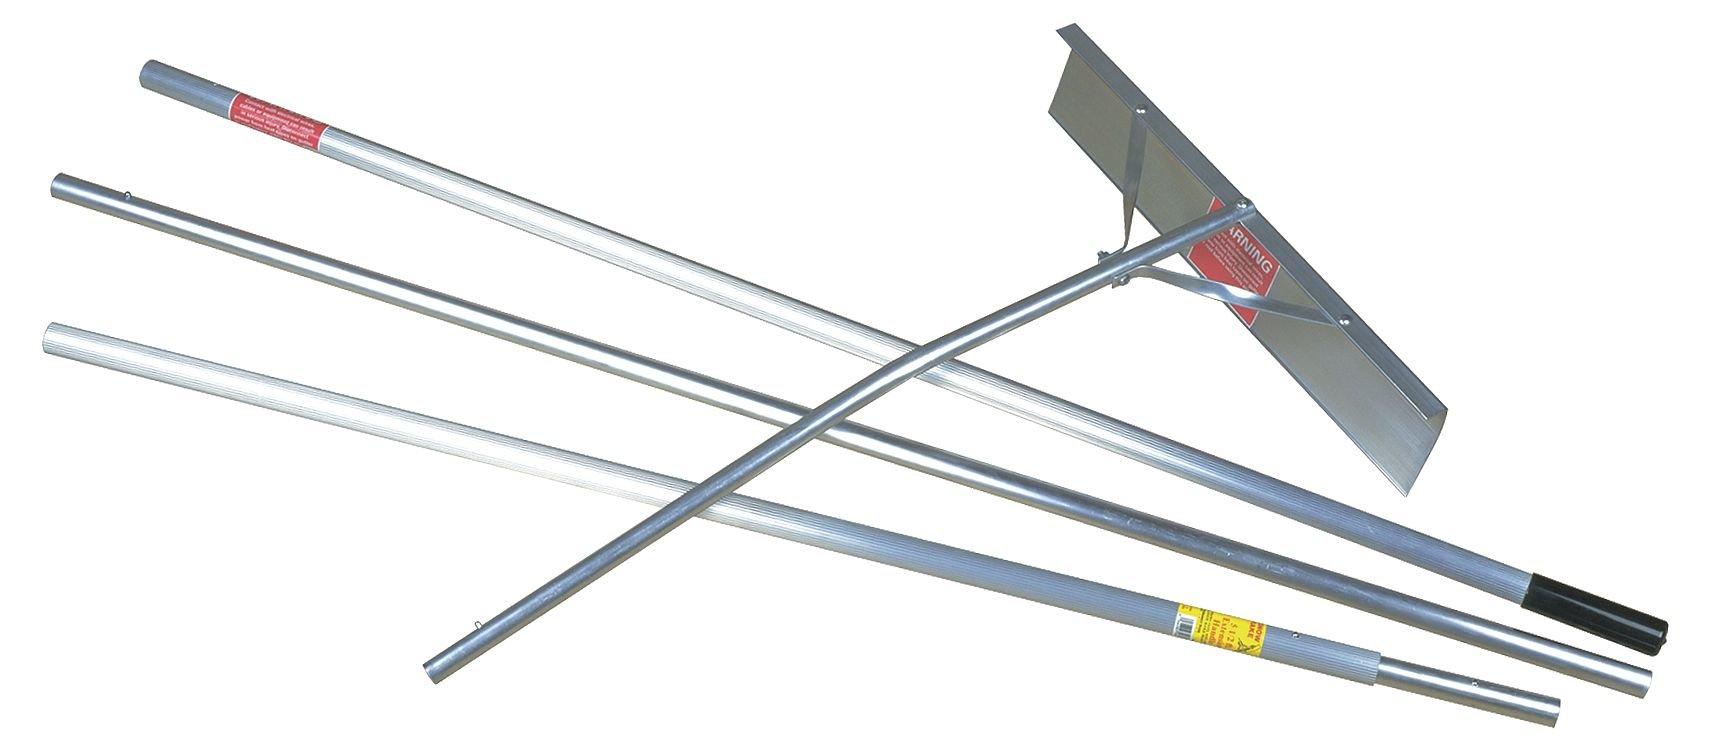 Snow Roof Rake Scraper, 24 in, 16 ft. by SEYMOUR MIDWEST RAKE